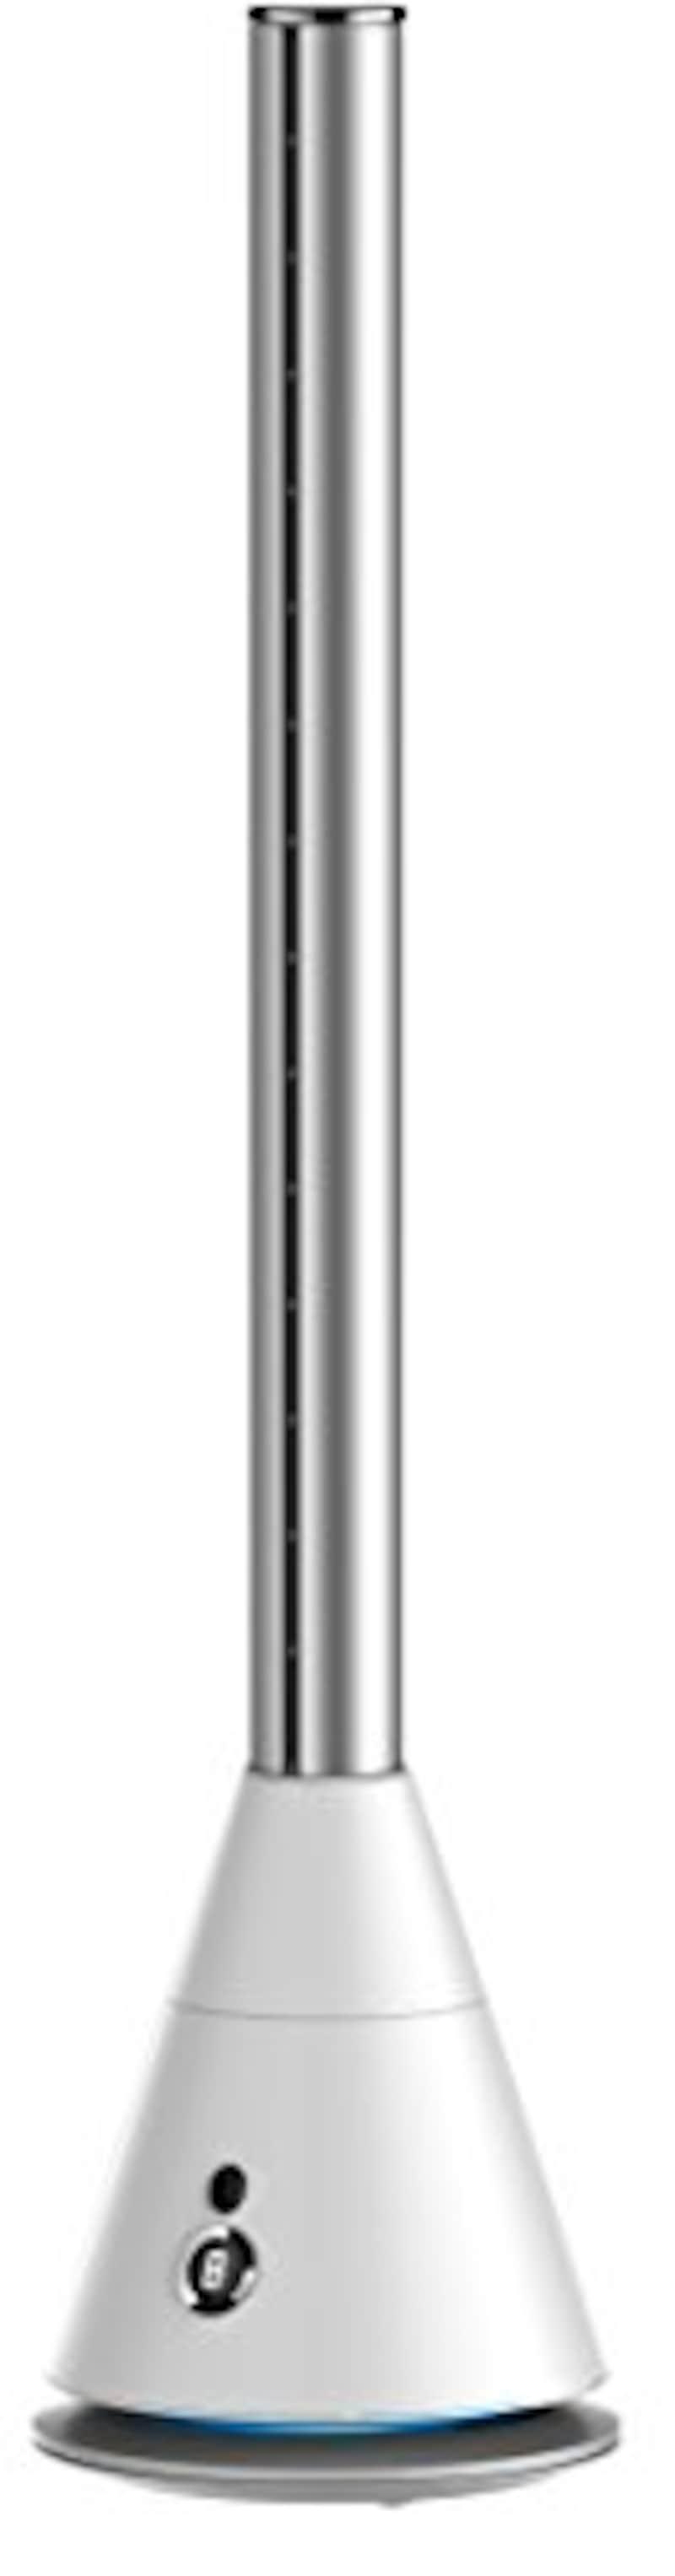 Comfor(コンフォー),Chrester(クレスター)空気清浄機能付 スリムタワーファン,COOL-D-001